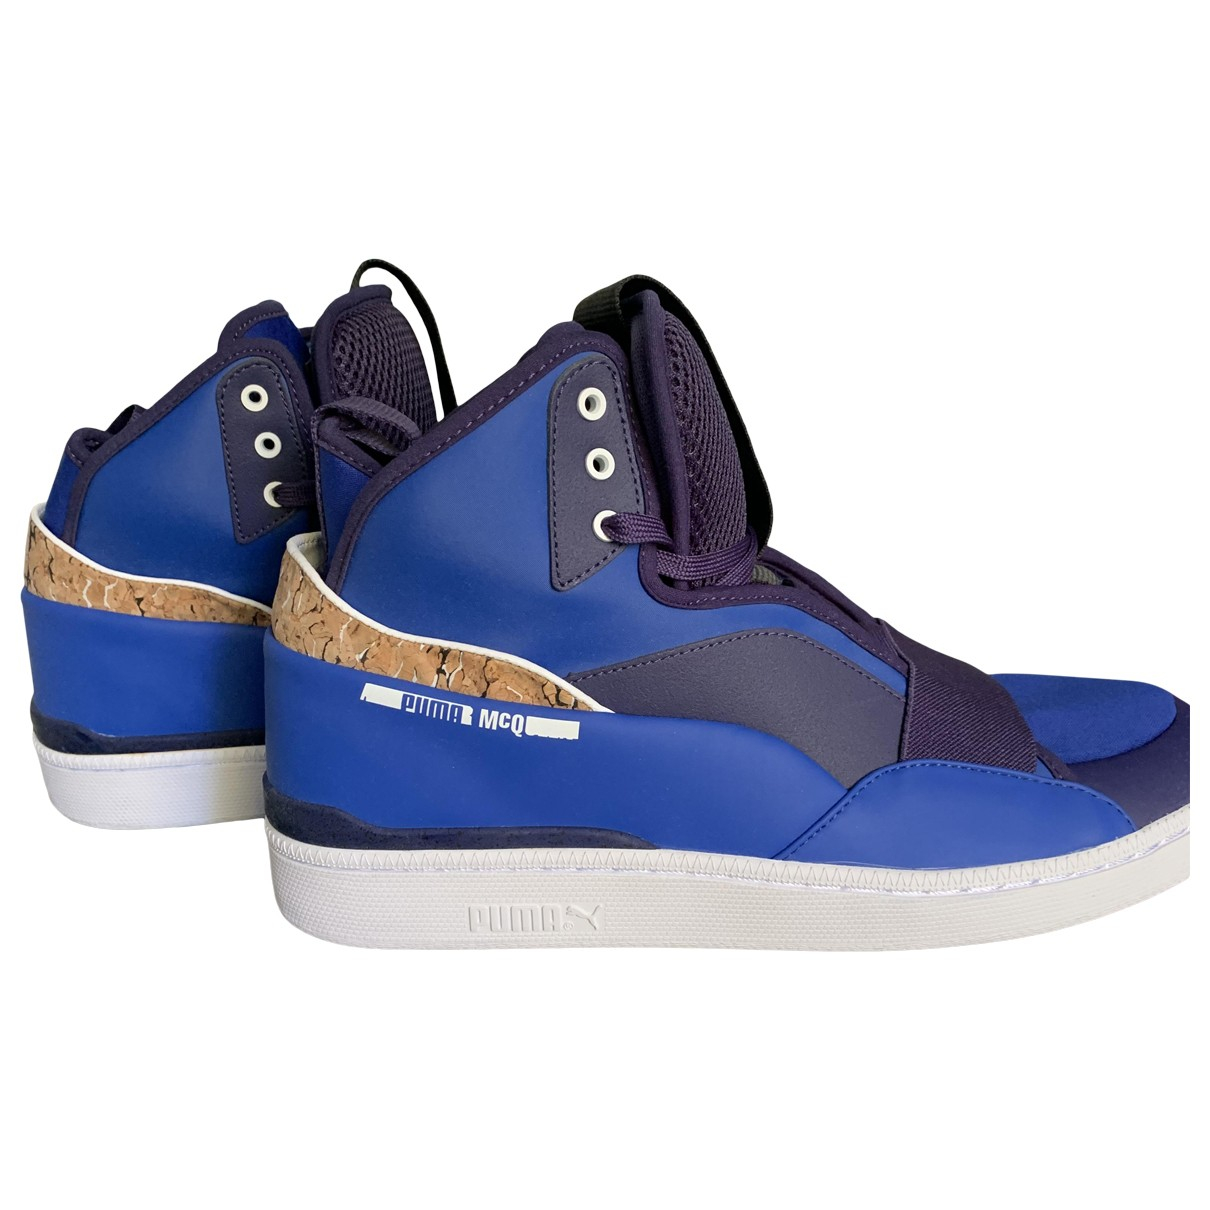 Alexander Mcqueen For Puma - Baskets   pour homme en cuir - bleu